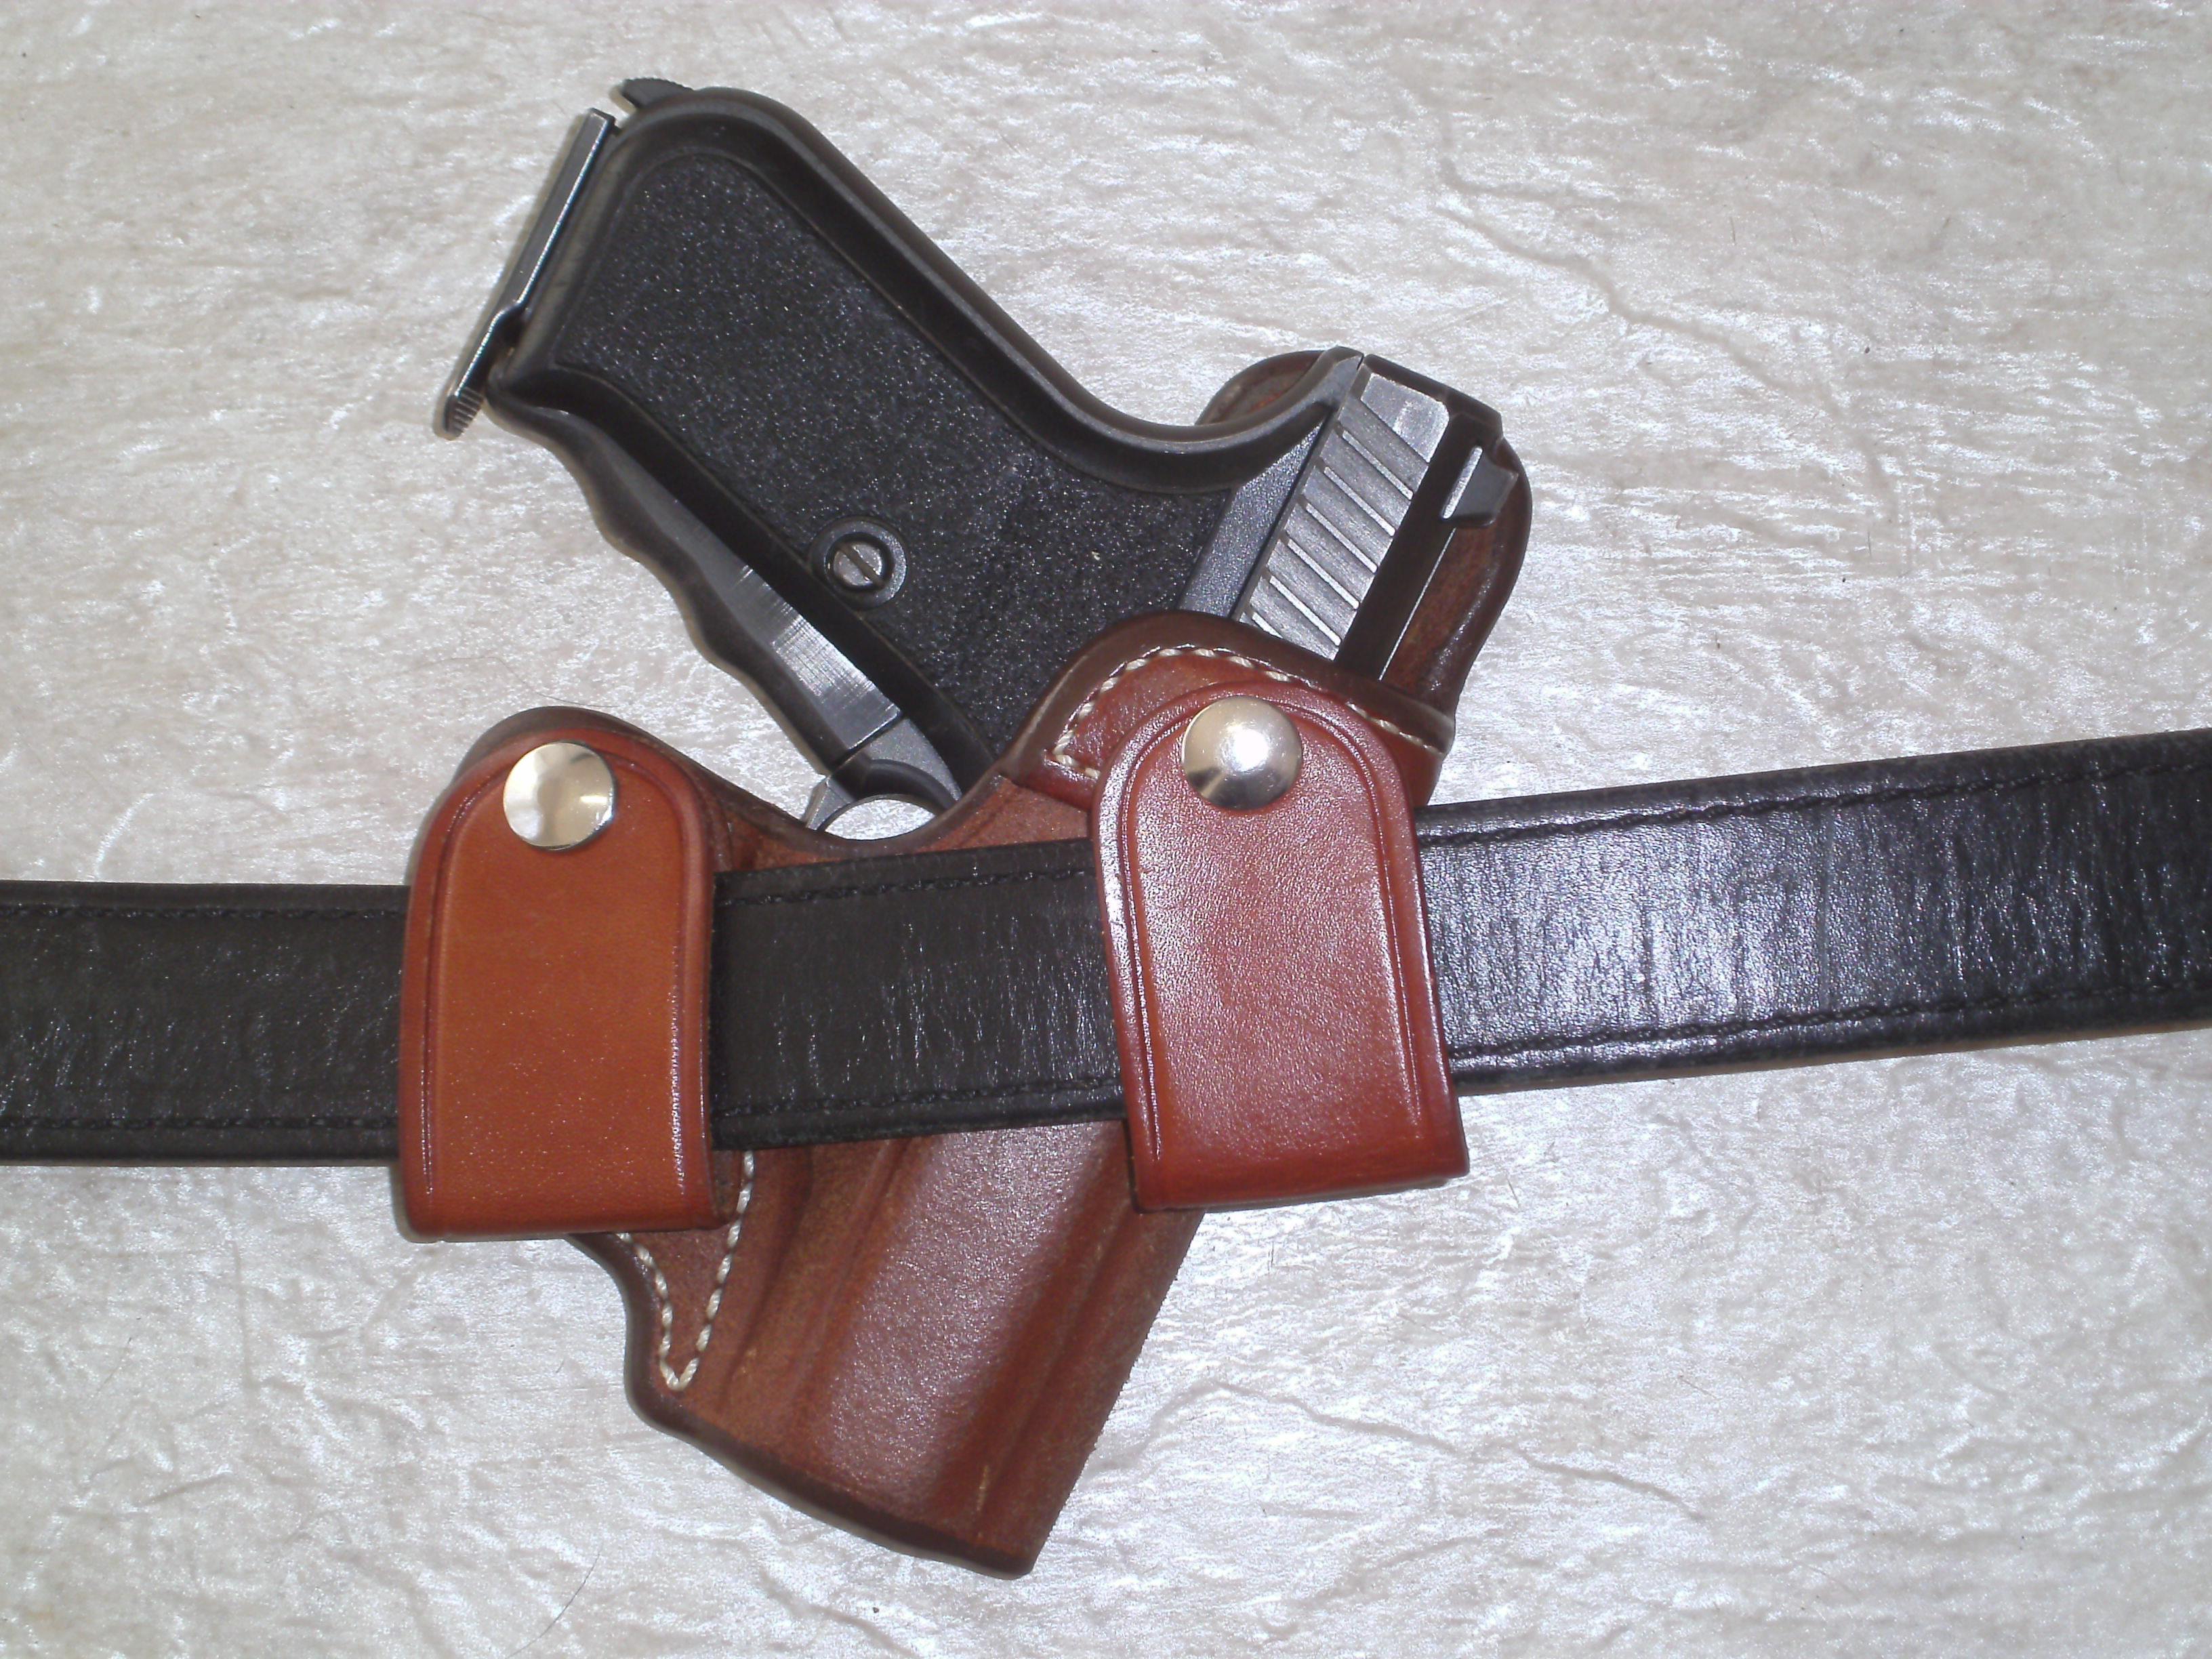 P7 PSP Gunleather for sale-sany1715.jpg